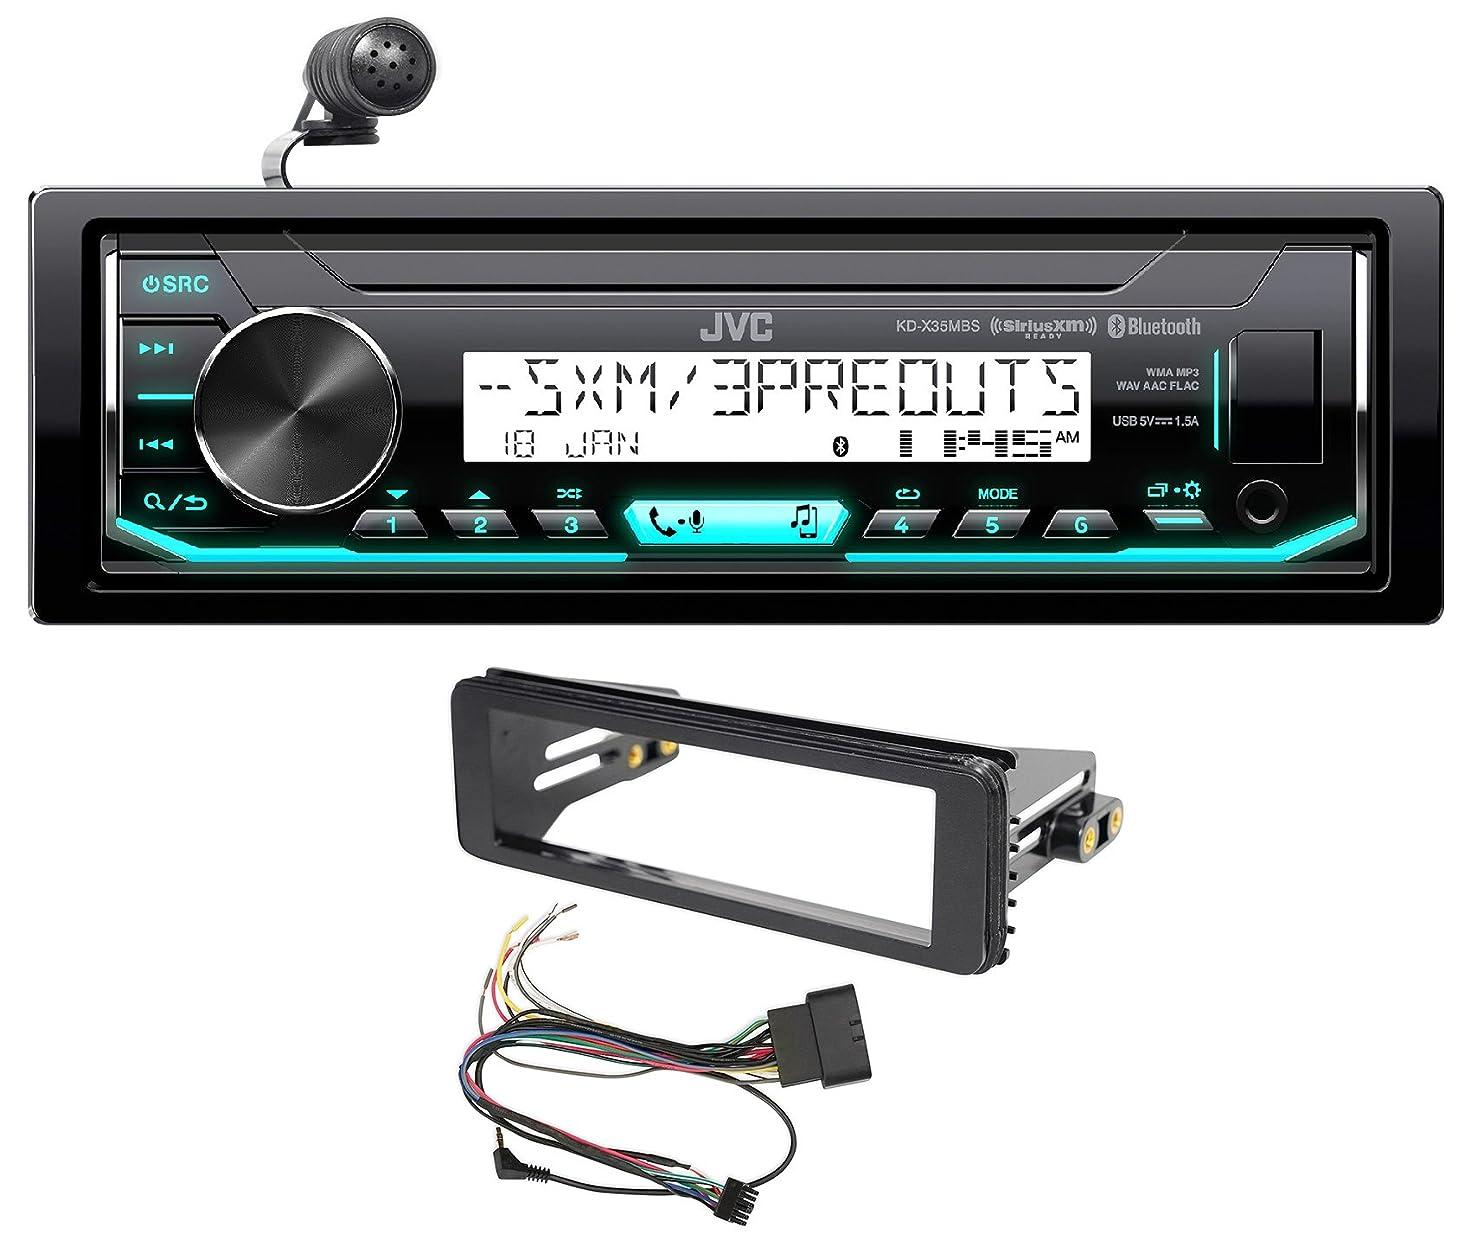 1998-2013 Harley Davidson FLHT FLHTC JVC Bluetooth Receiver Stereo Upgrade Kit